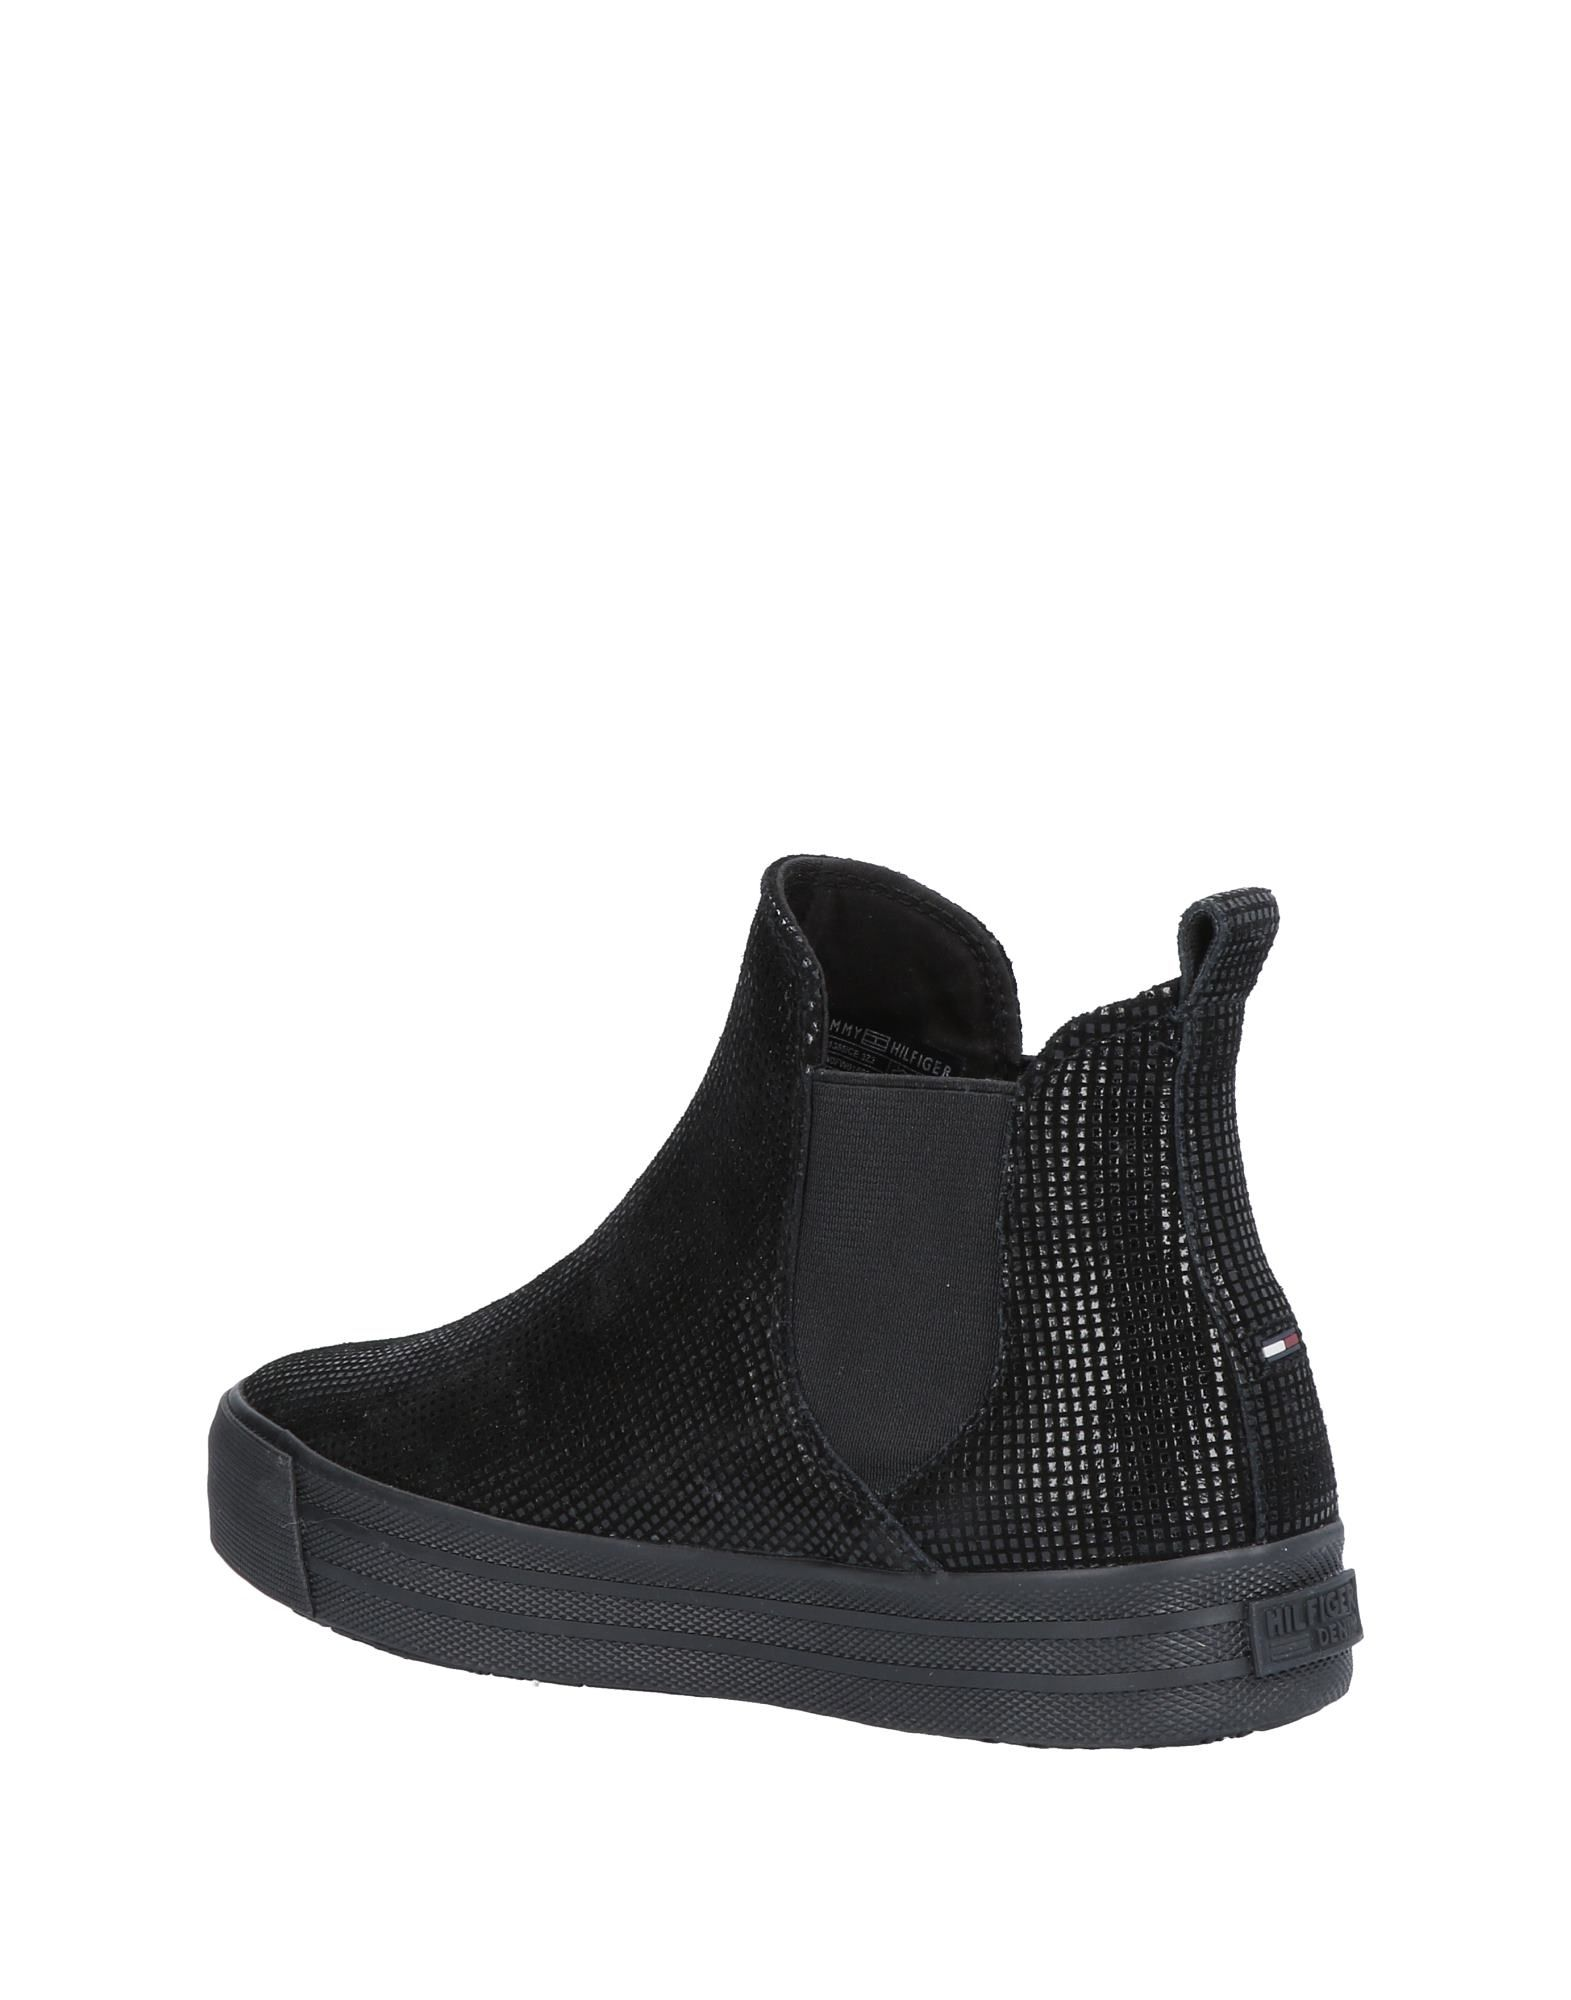 Tommy Jeans Sneakers Damen beliebte  11460045KM Gute Qualität beliebte Damen Schuhe 815664